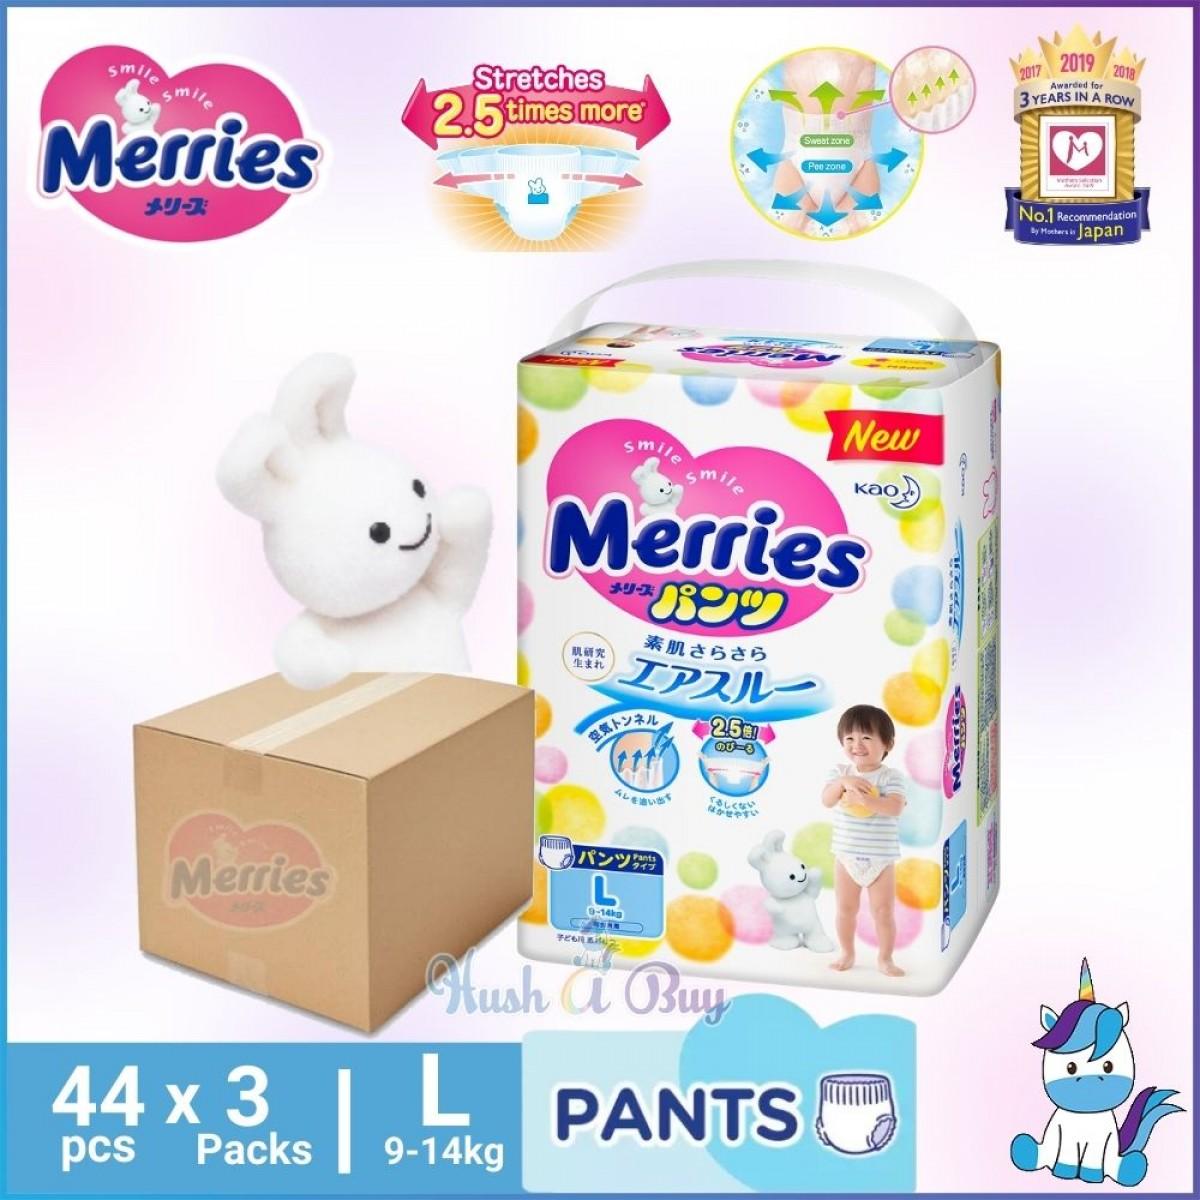 (1 CTN) Merries Super Premium Pants - M58 / L44 / XL38 / XXL26 - Baby Diapers